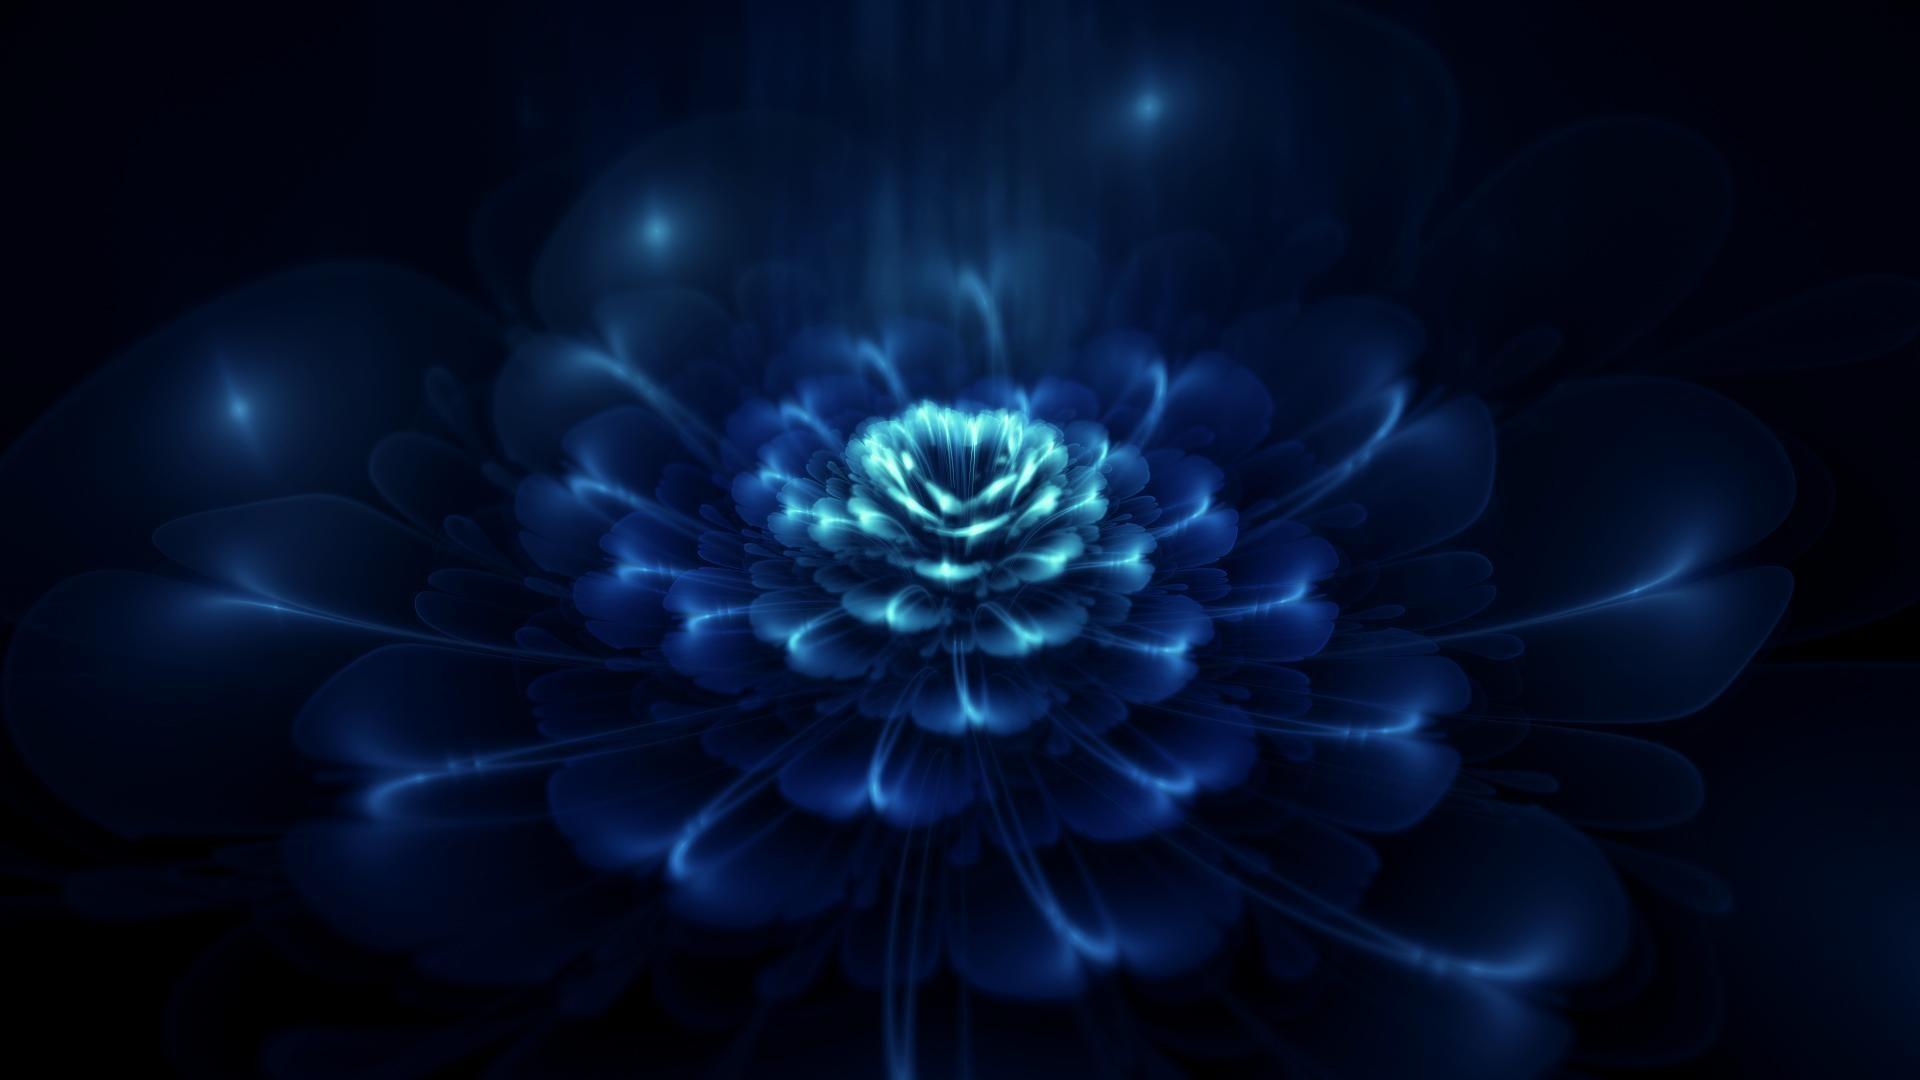 Midwinter-blue-abstract-flower